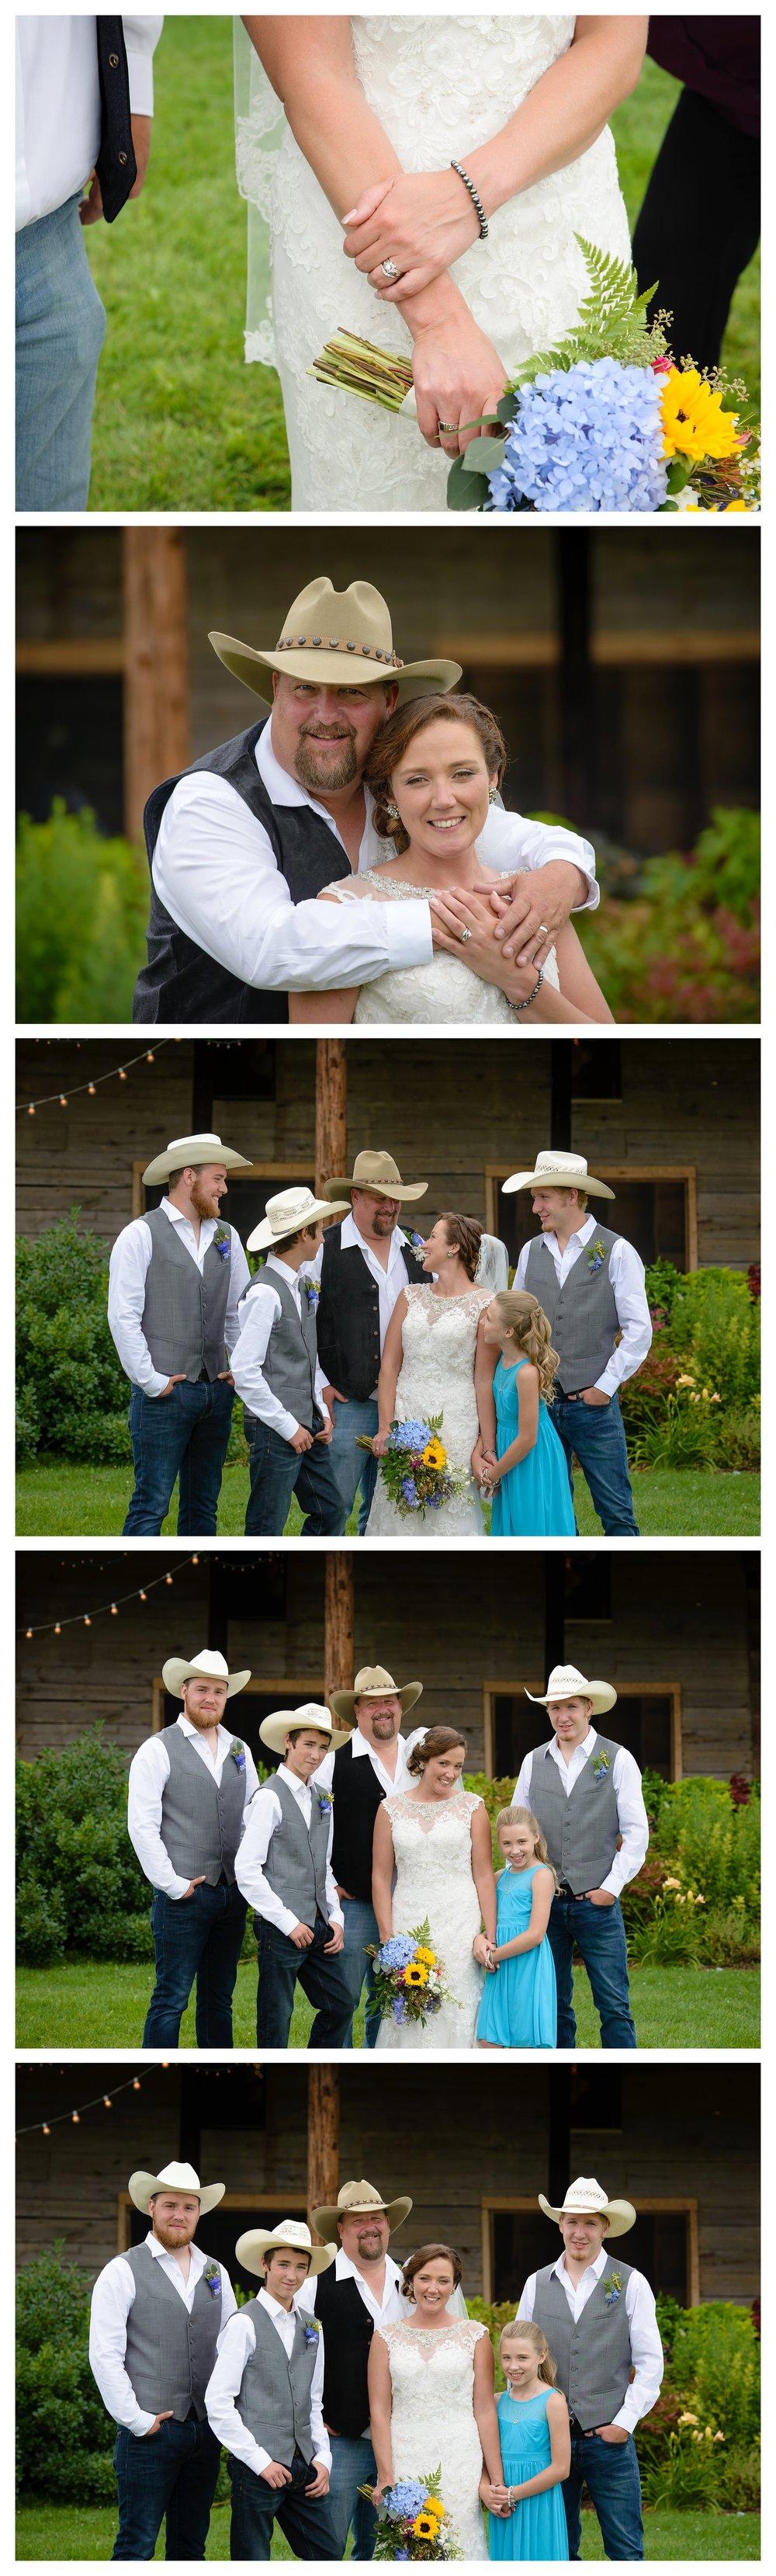 ps 139 photography jen jensen ashland freehands farm wedding northwoods_0036.jpg